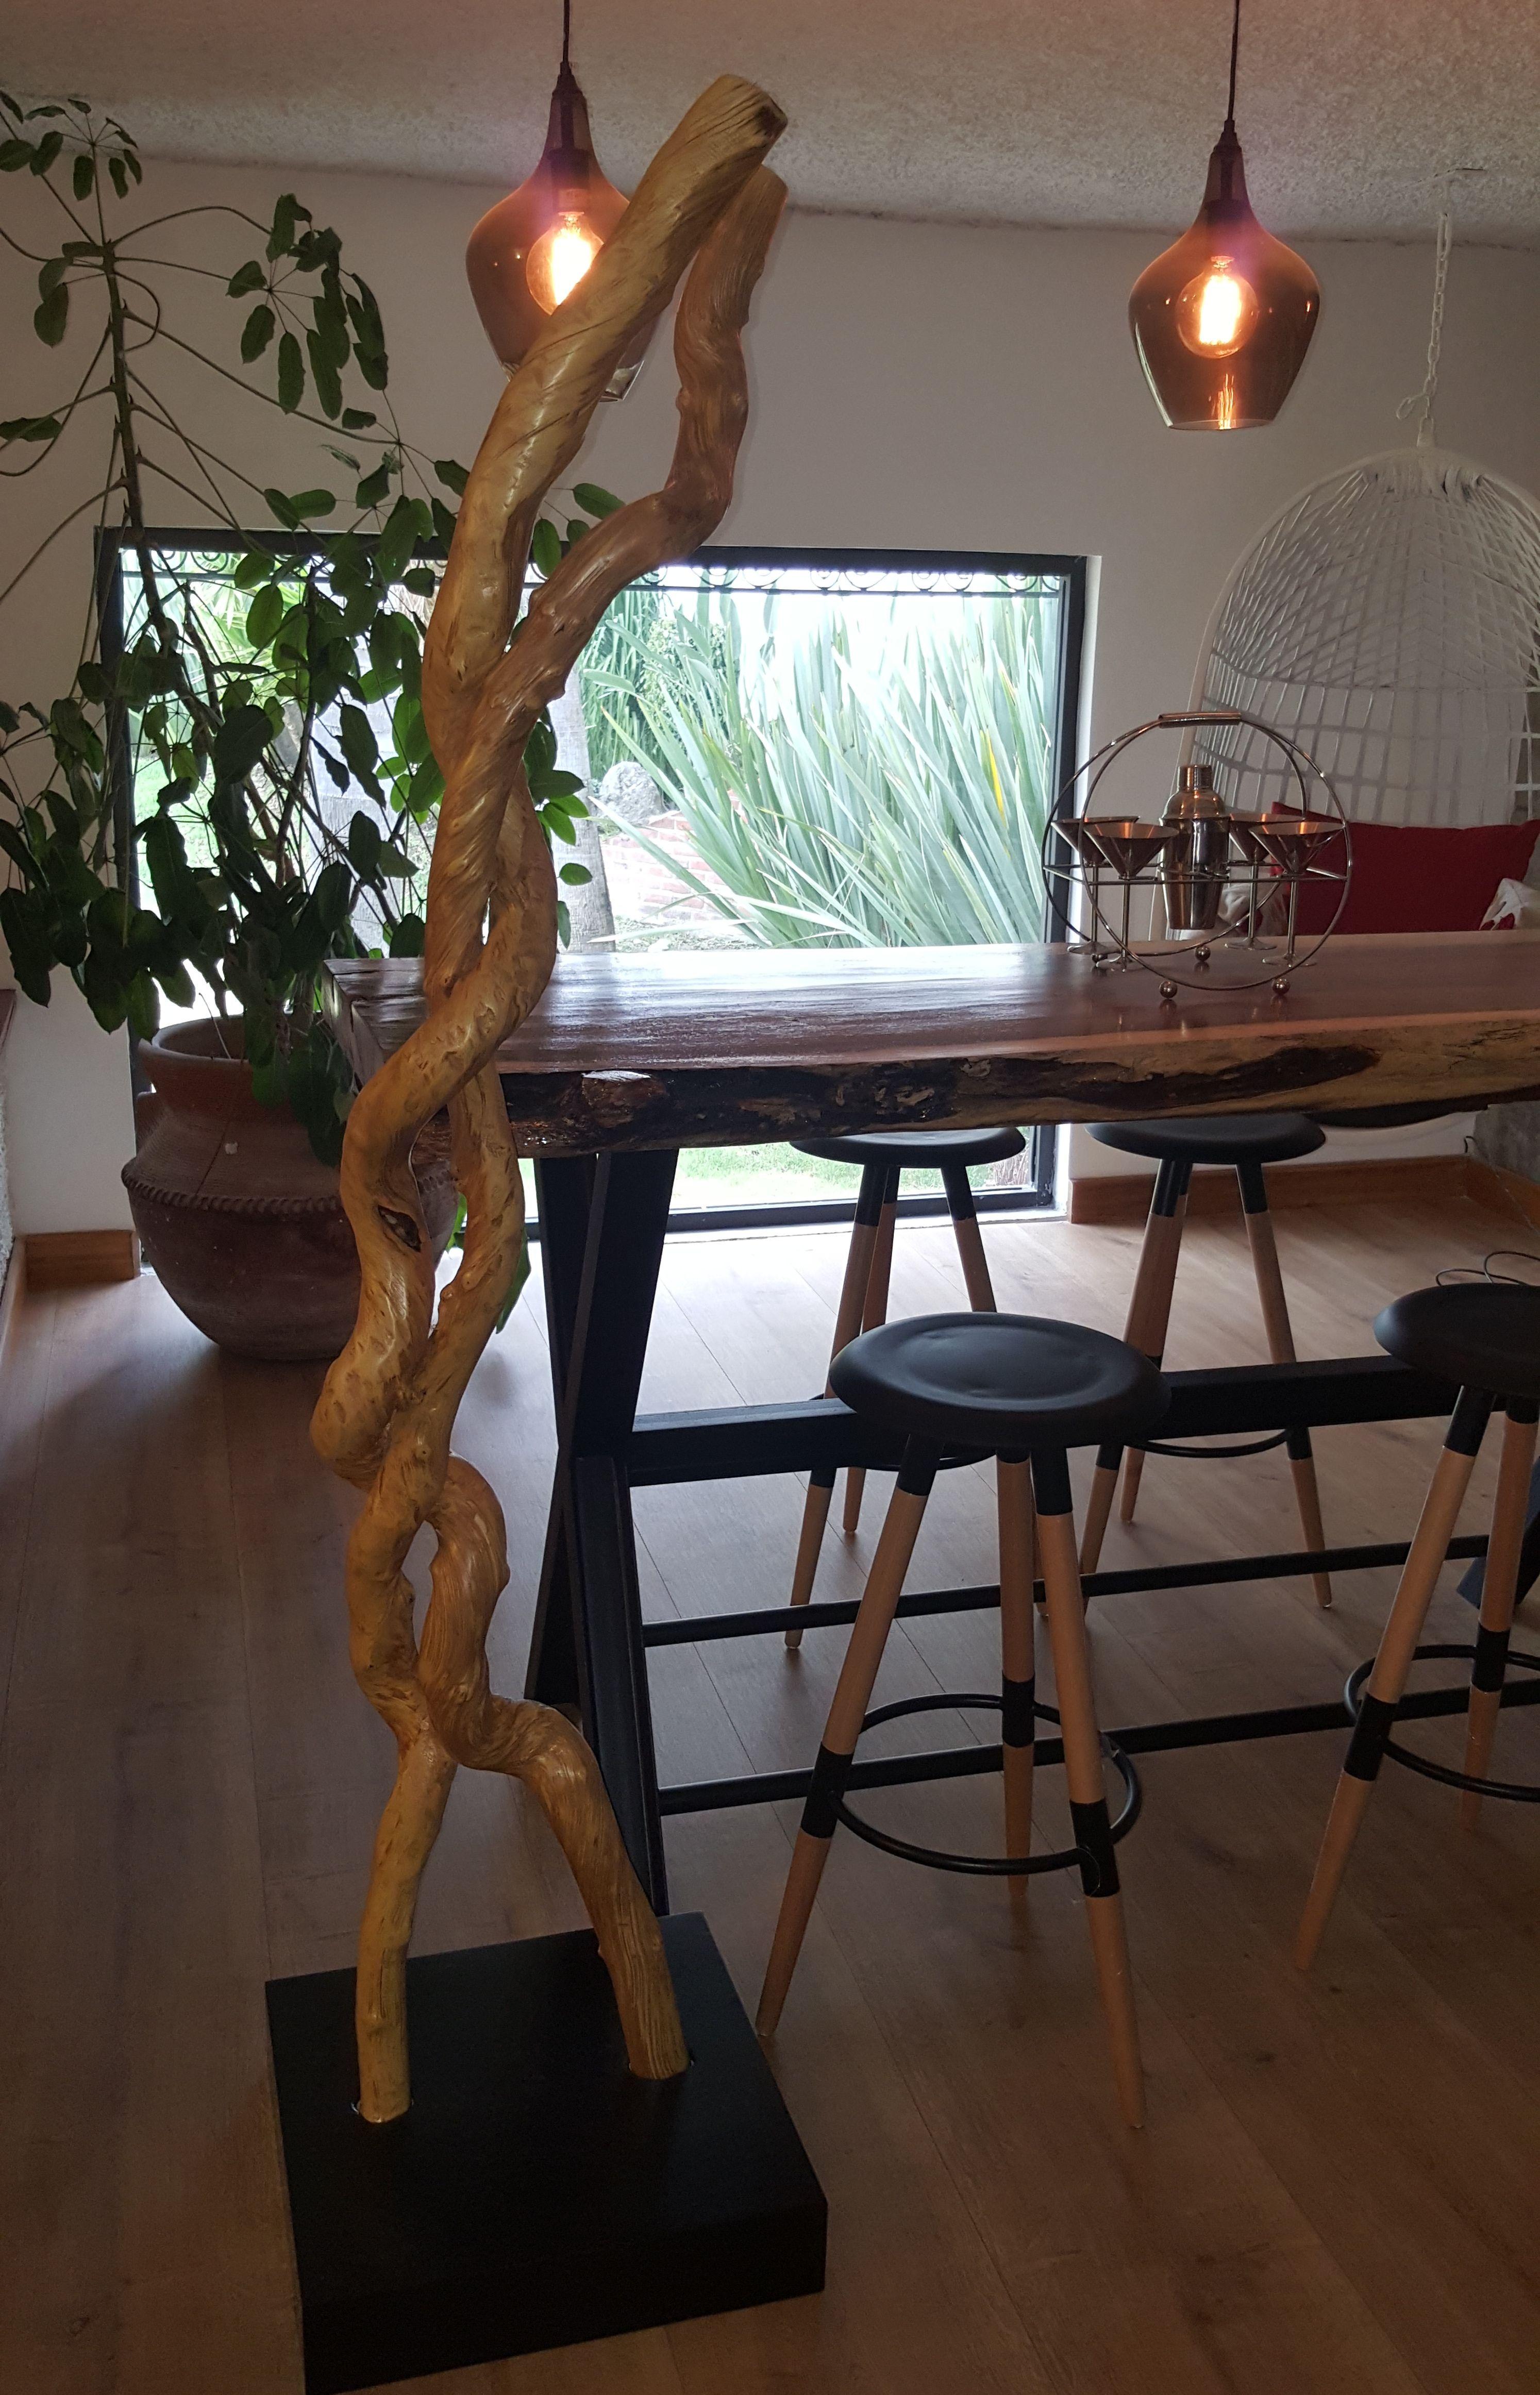 Muebles Rusticos De Bejuco - Decoraci N Base Con Ramas De Bejuco De La Sierra De Jalisco [mjhdah]https://i.pinimg.com/originals/96/cd/ac/96cdac86efff53e477d27644431317c8.jpg